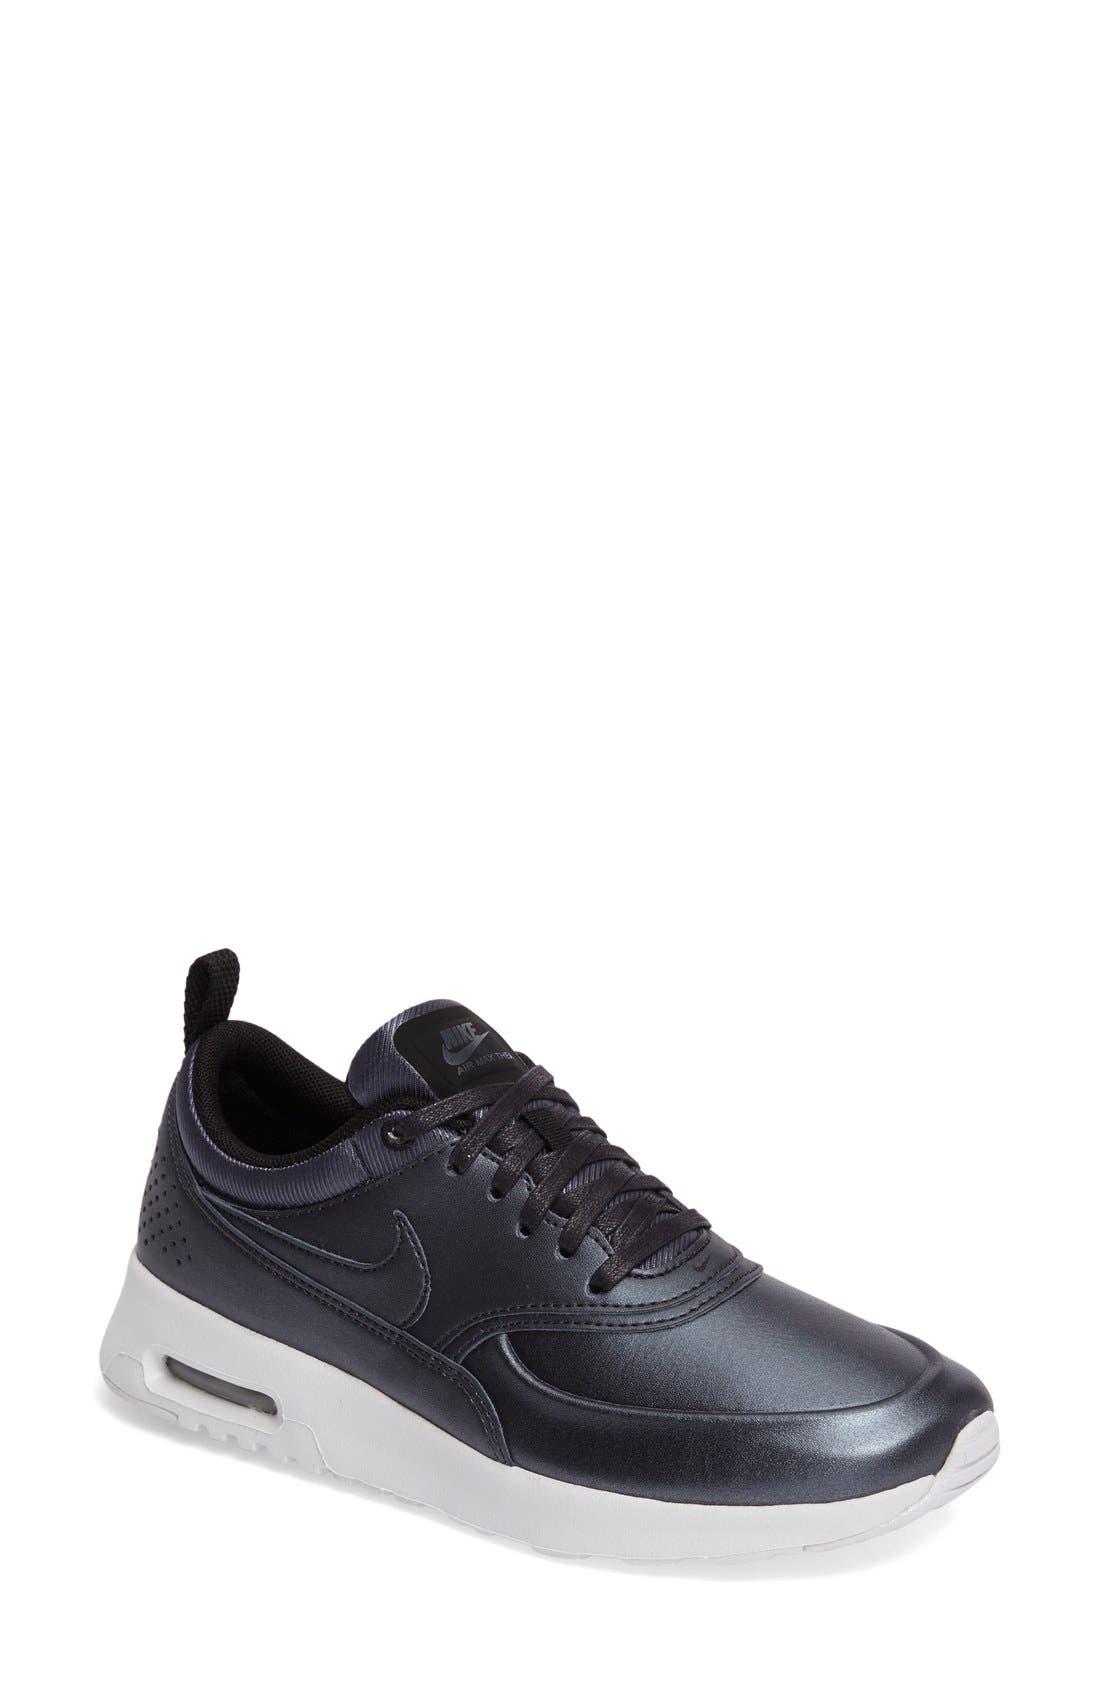 Air Max Thea SE Sneaker,                             Main thumbnail 1, color,                             002